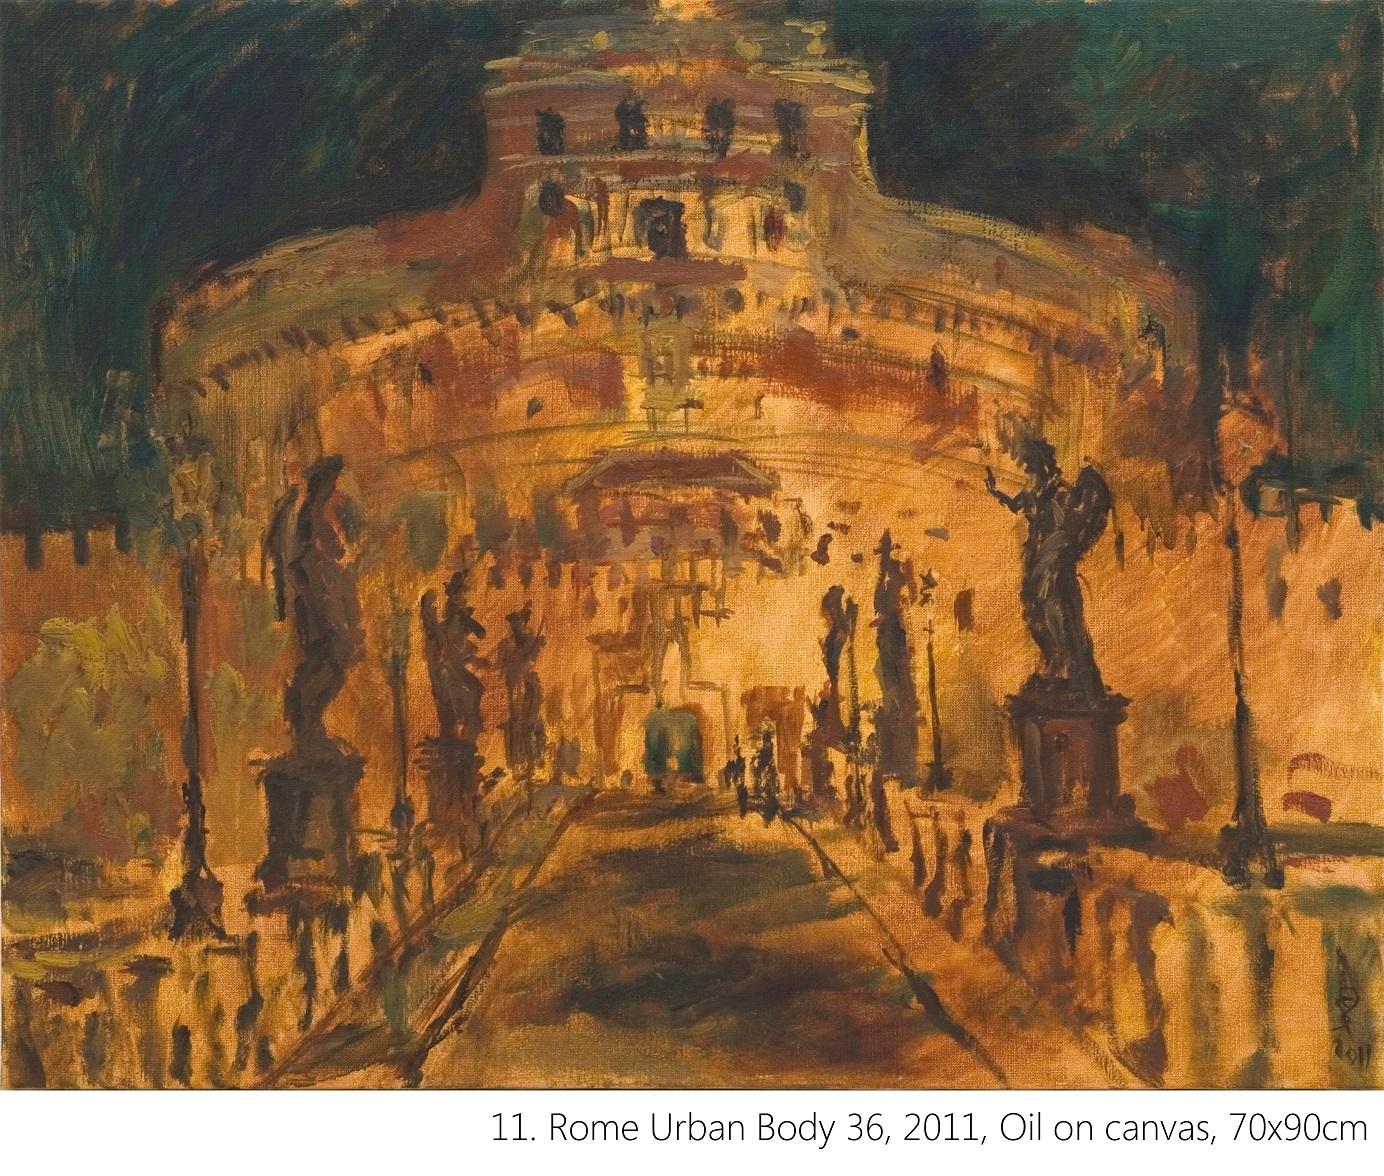 11. Rome Urban Body 36, 2011, Oil on canvas, 70x90cm